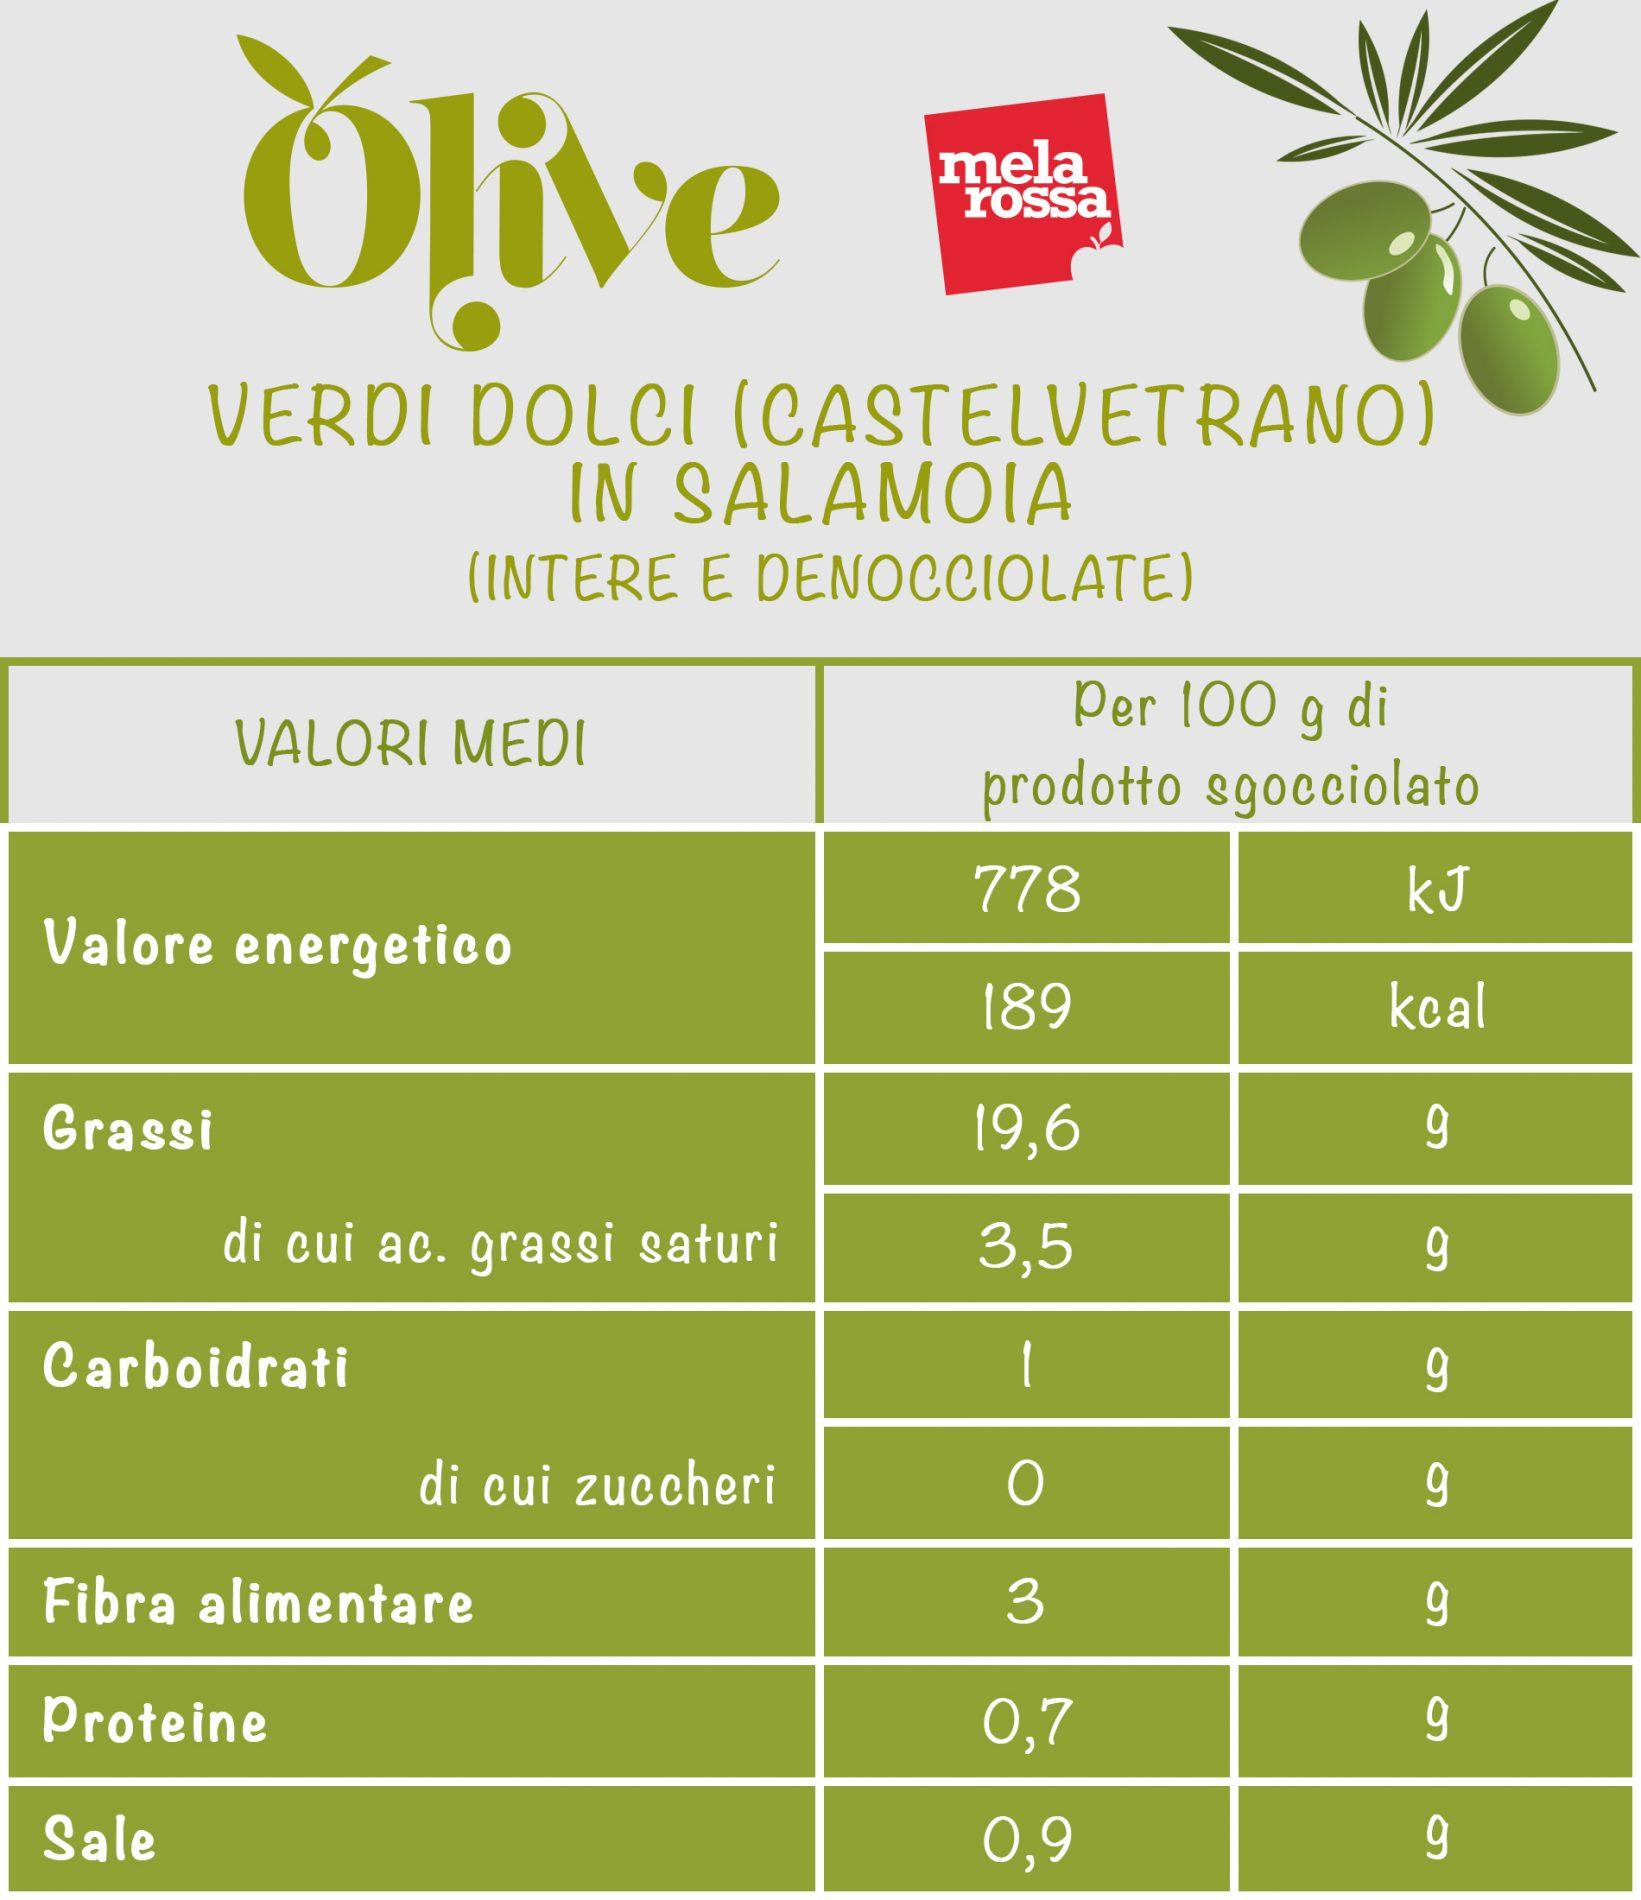 olive verdi dolci: calorie e valori nutrizionali